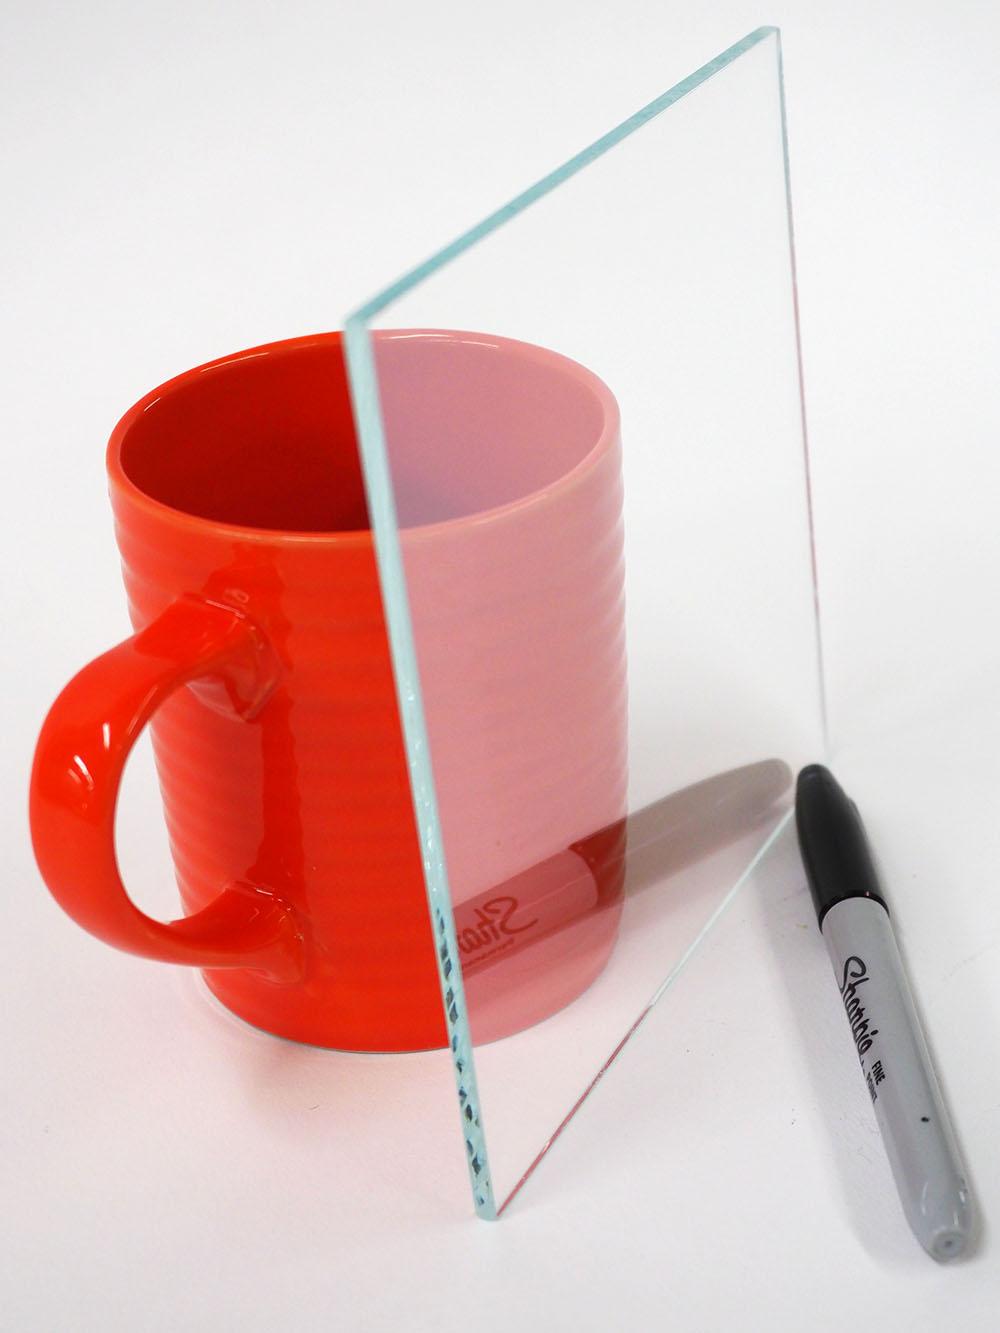 Dielectric Beamsplitter Glass